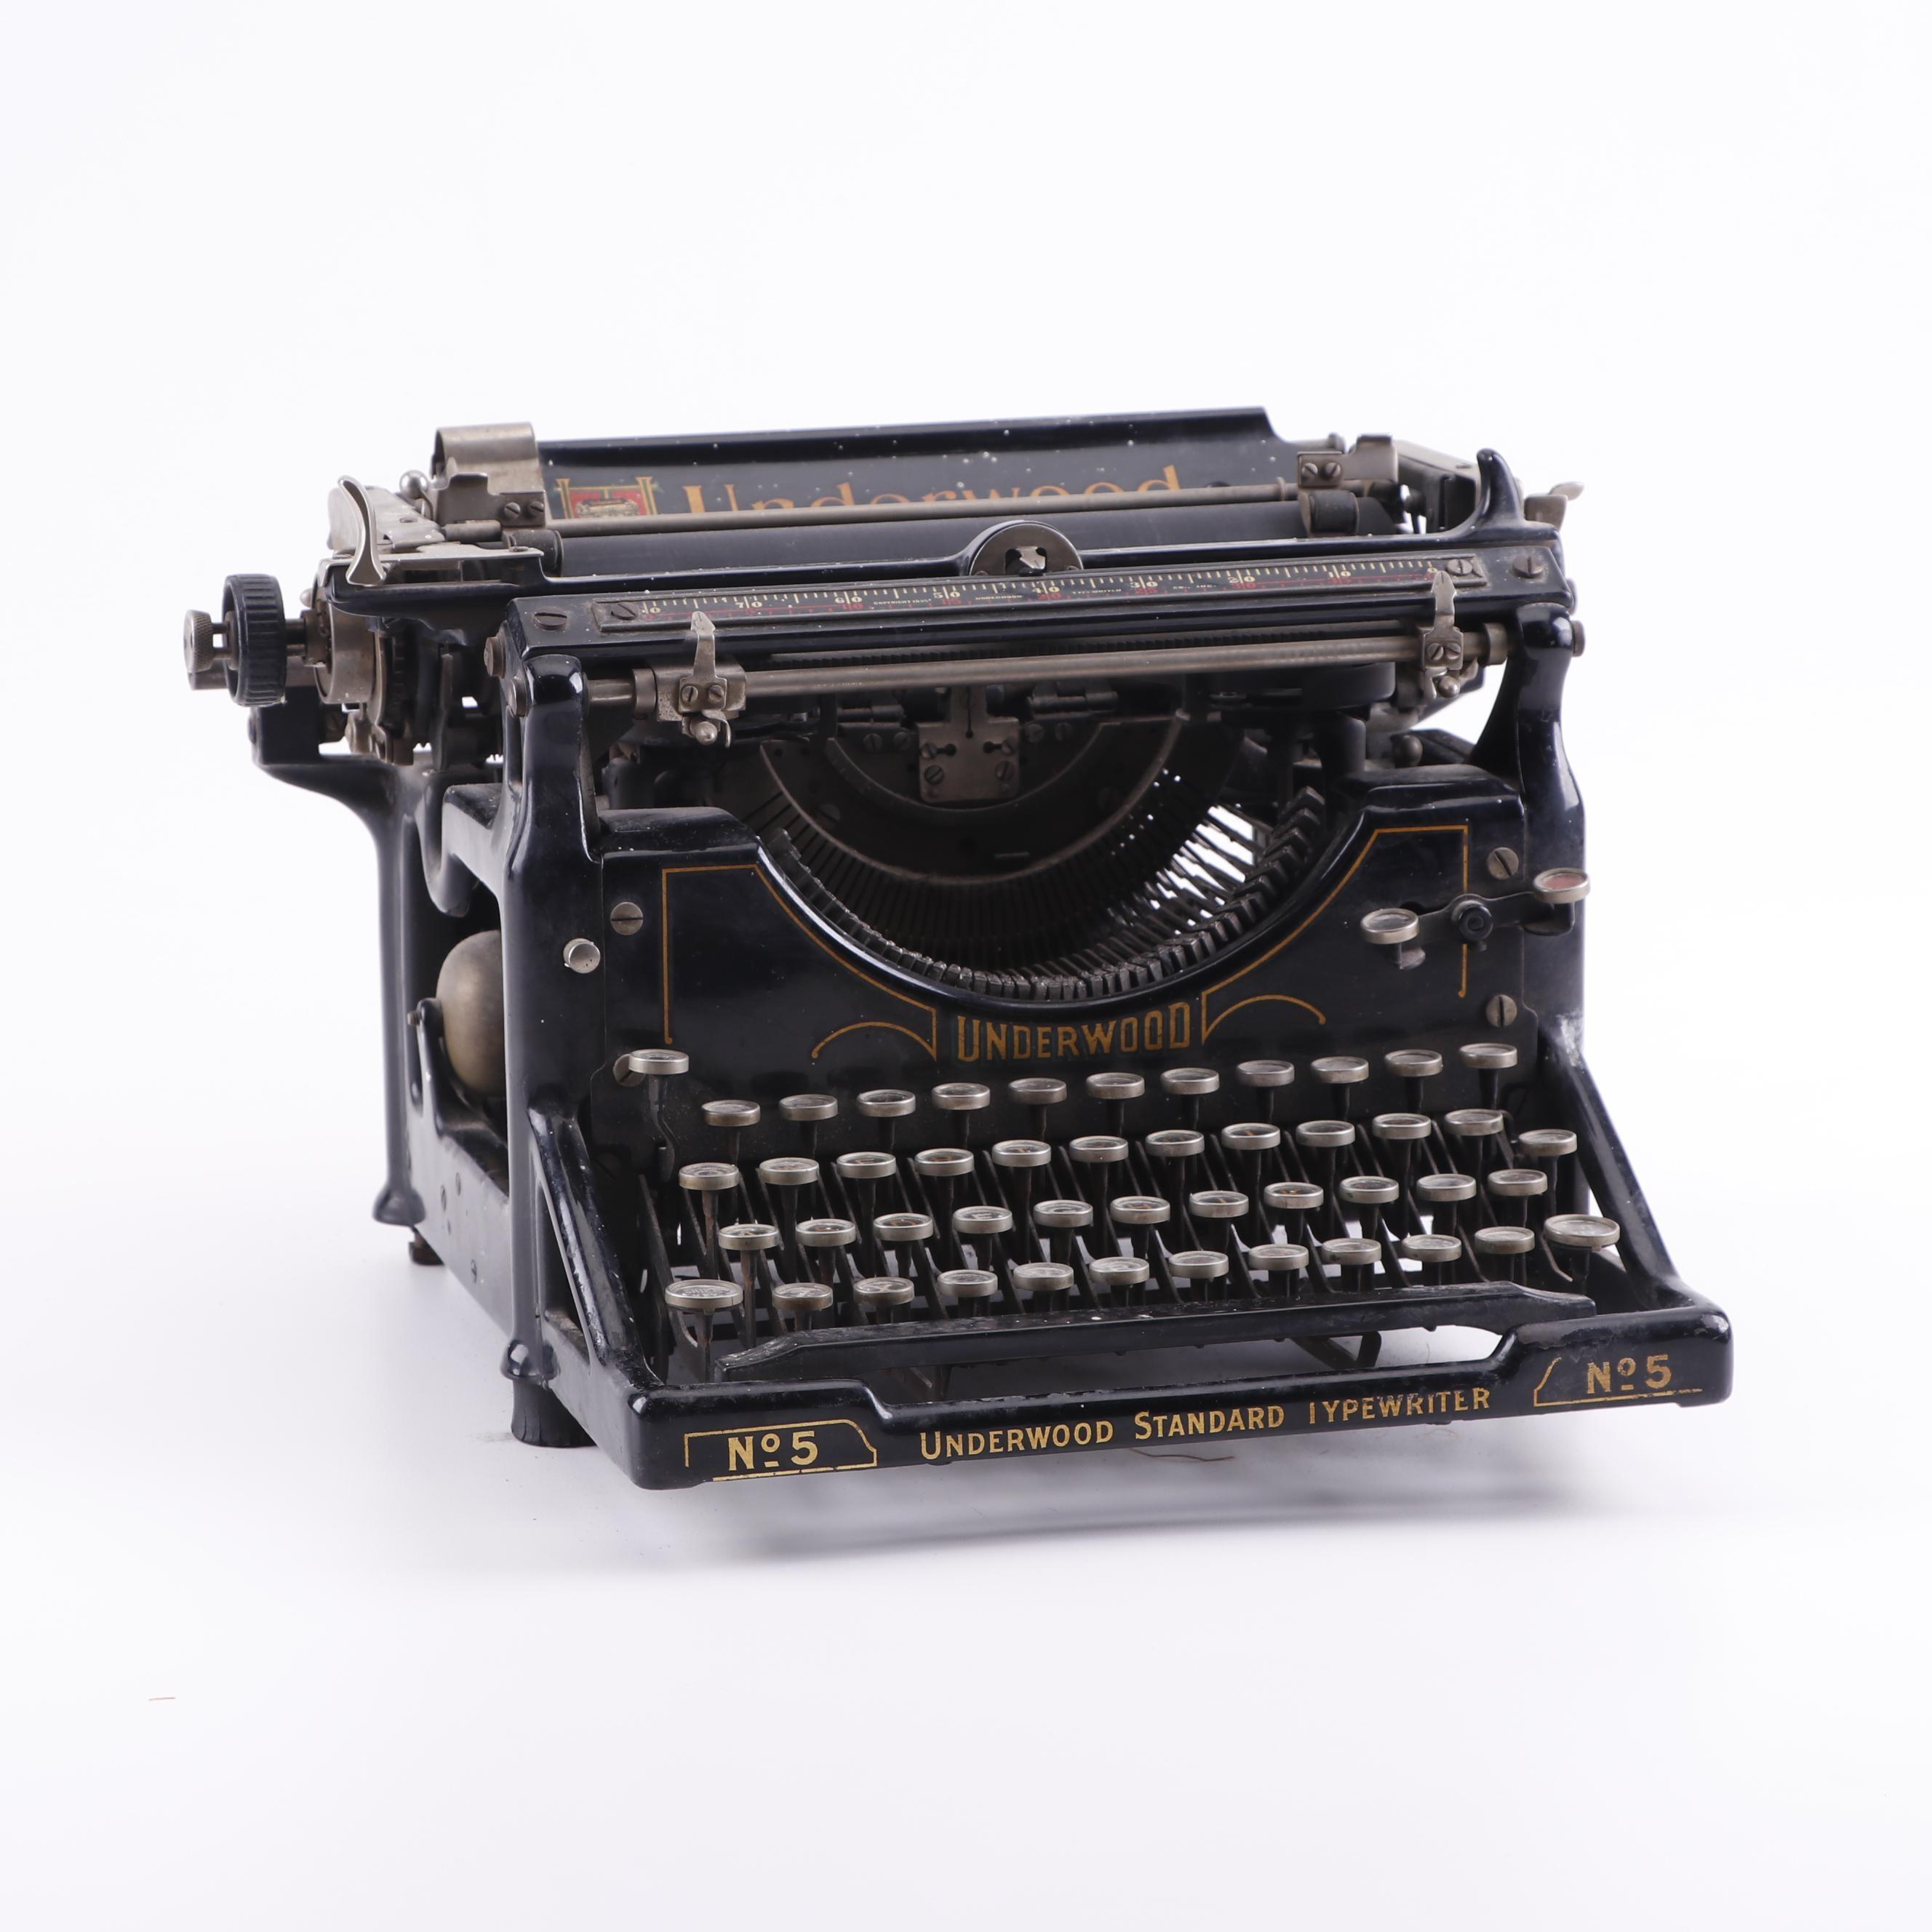 Underwood No. 5 Standard Typewriter, Early 20th Century